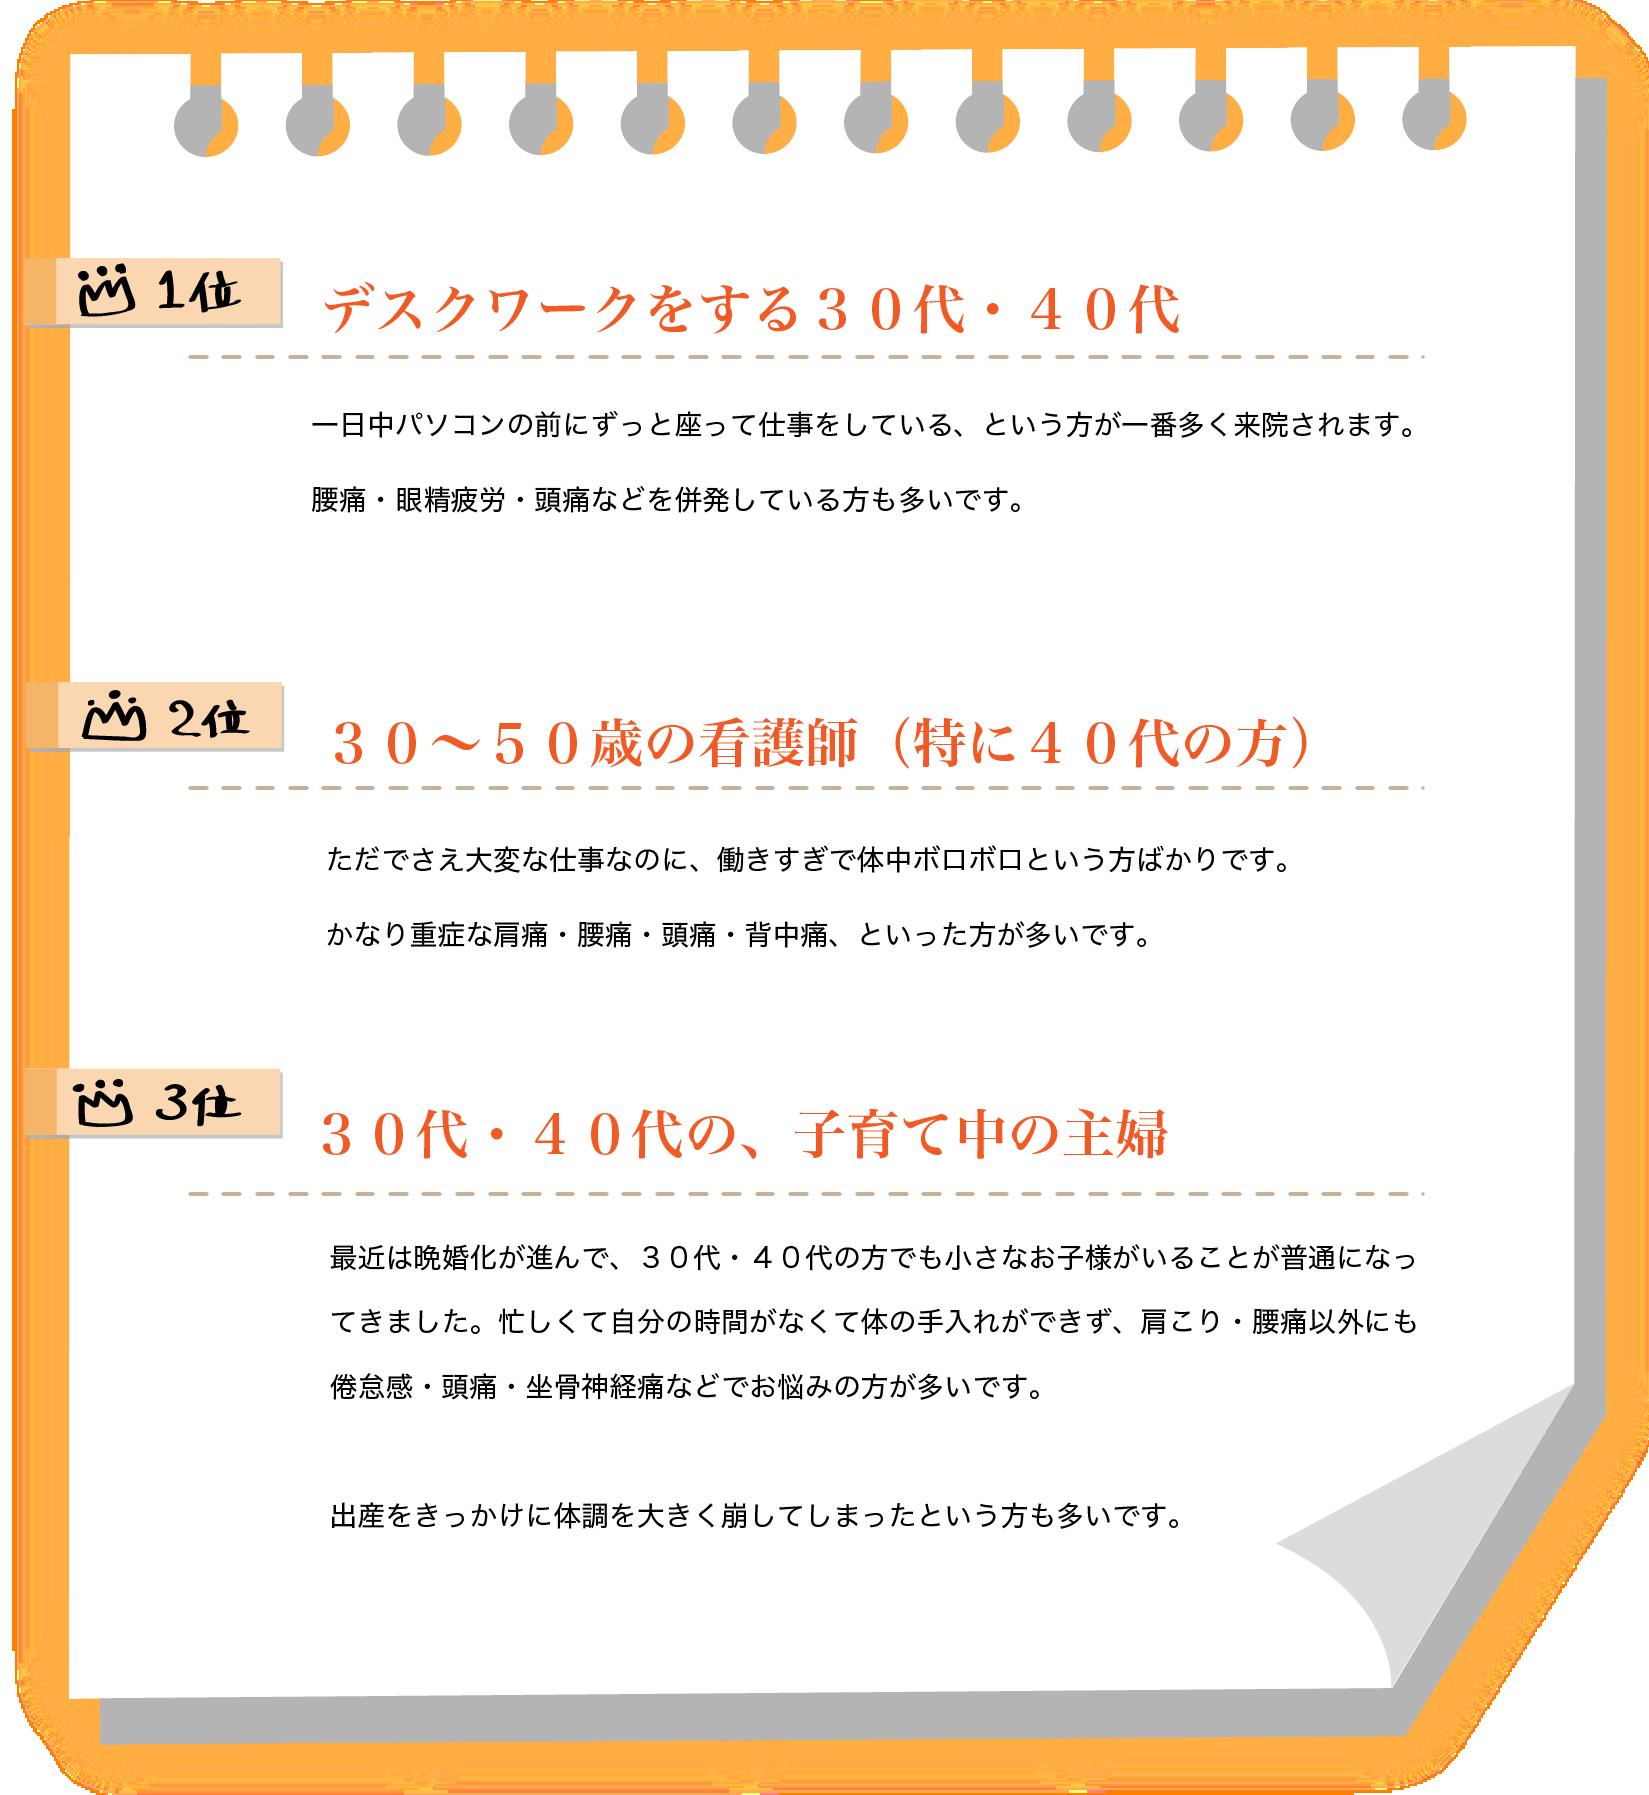 sozai 22 - 当施設紹介